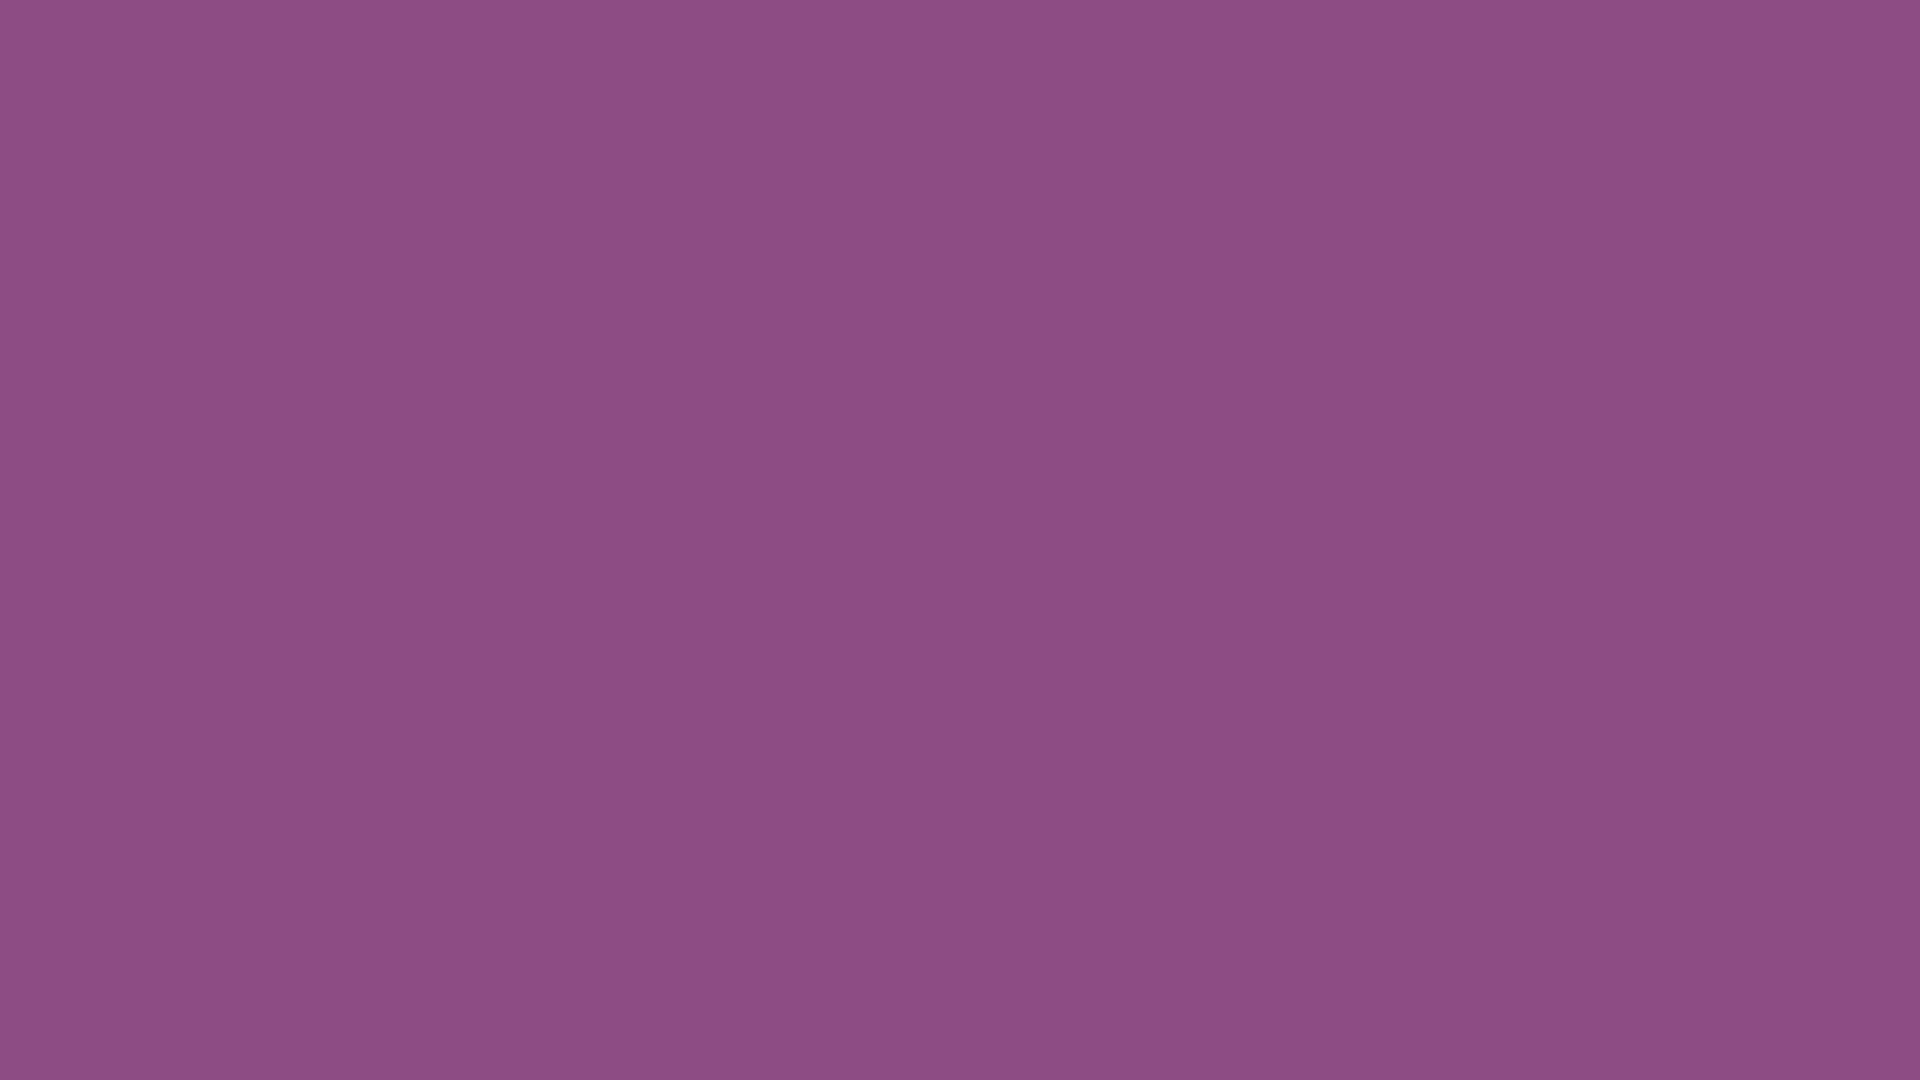 1920x1080 Razzmic Berry Solid Color Background